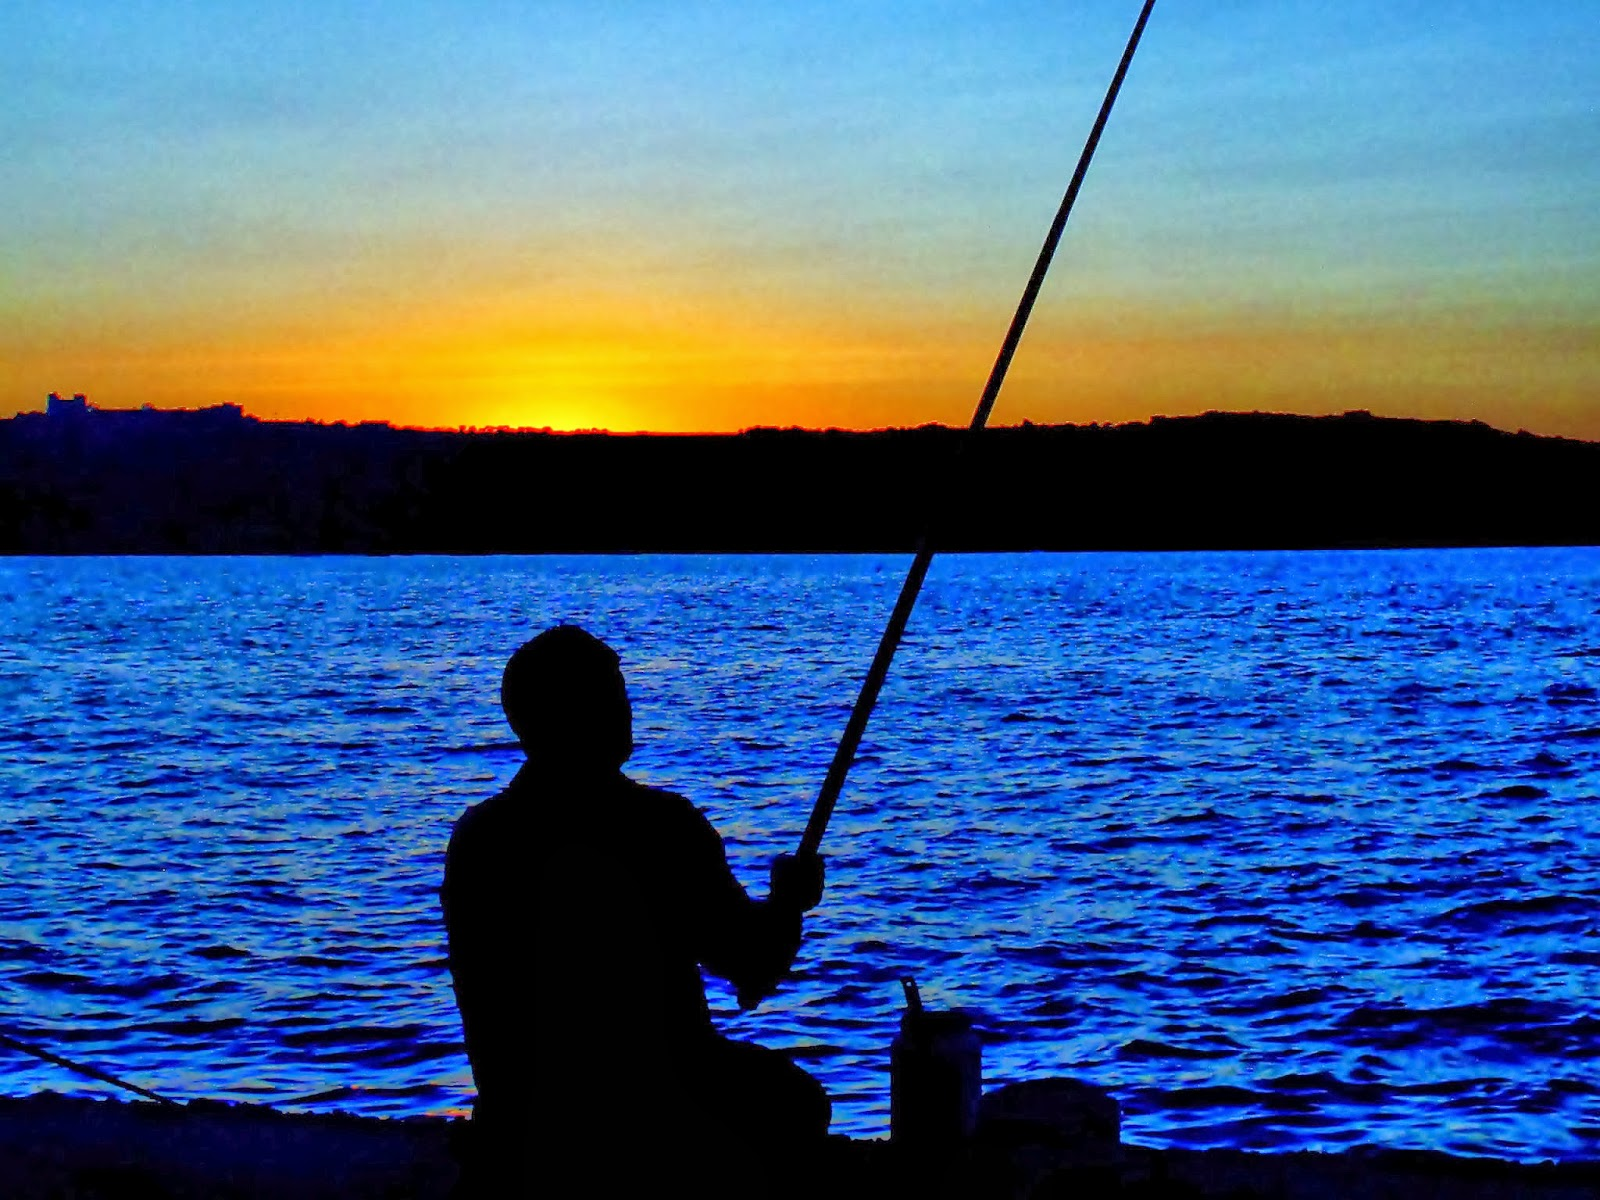 Silhouette of man fishing at sunset.